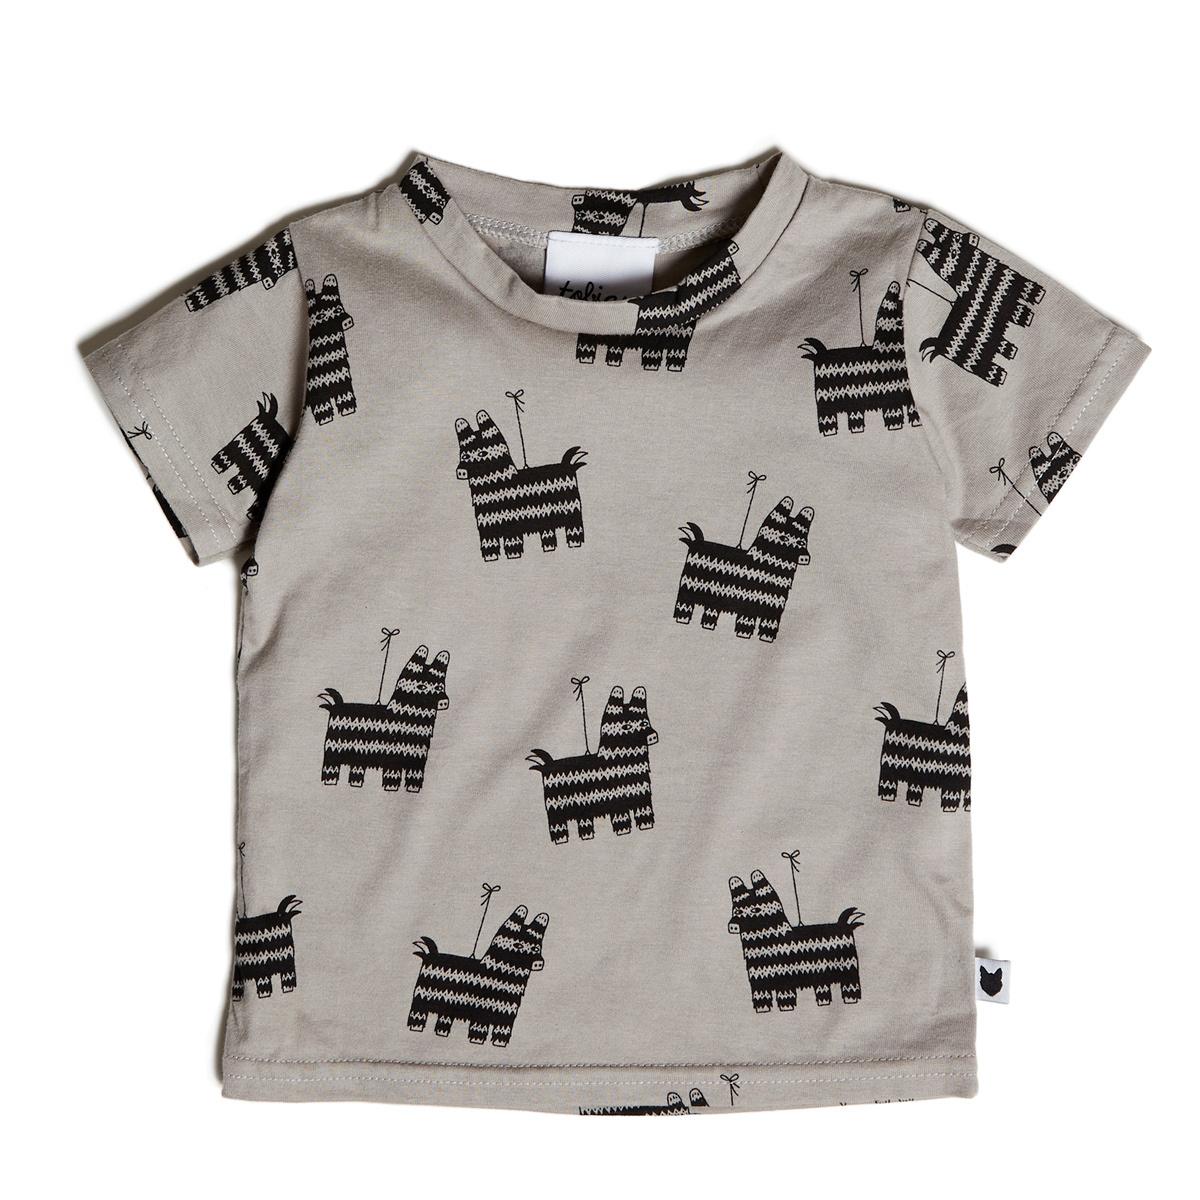 Hauts bébé Tee-Shirt Pinata Party - 6/12 Mois Tee-Shirt Pinata Party - 6/12 Mois